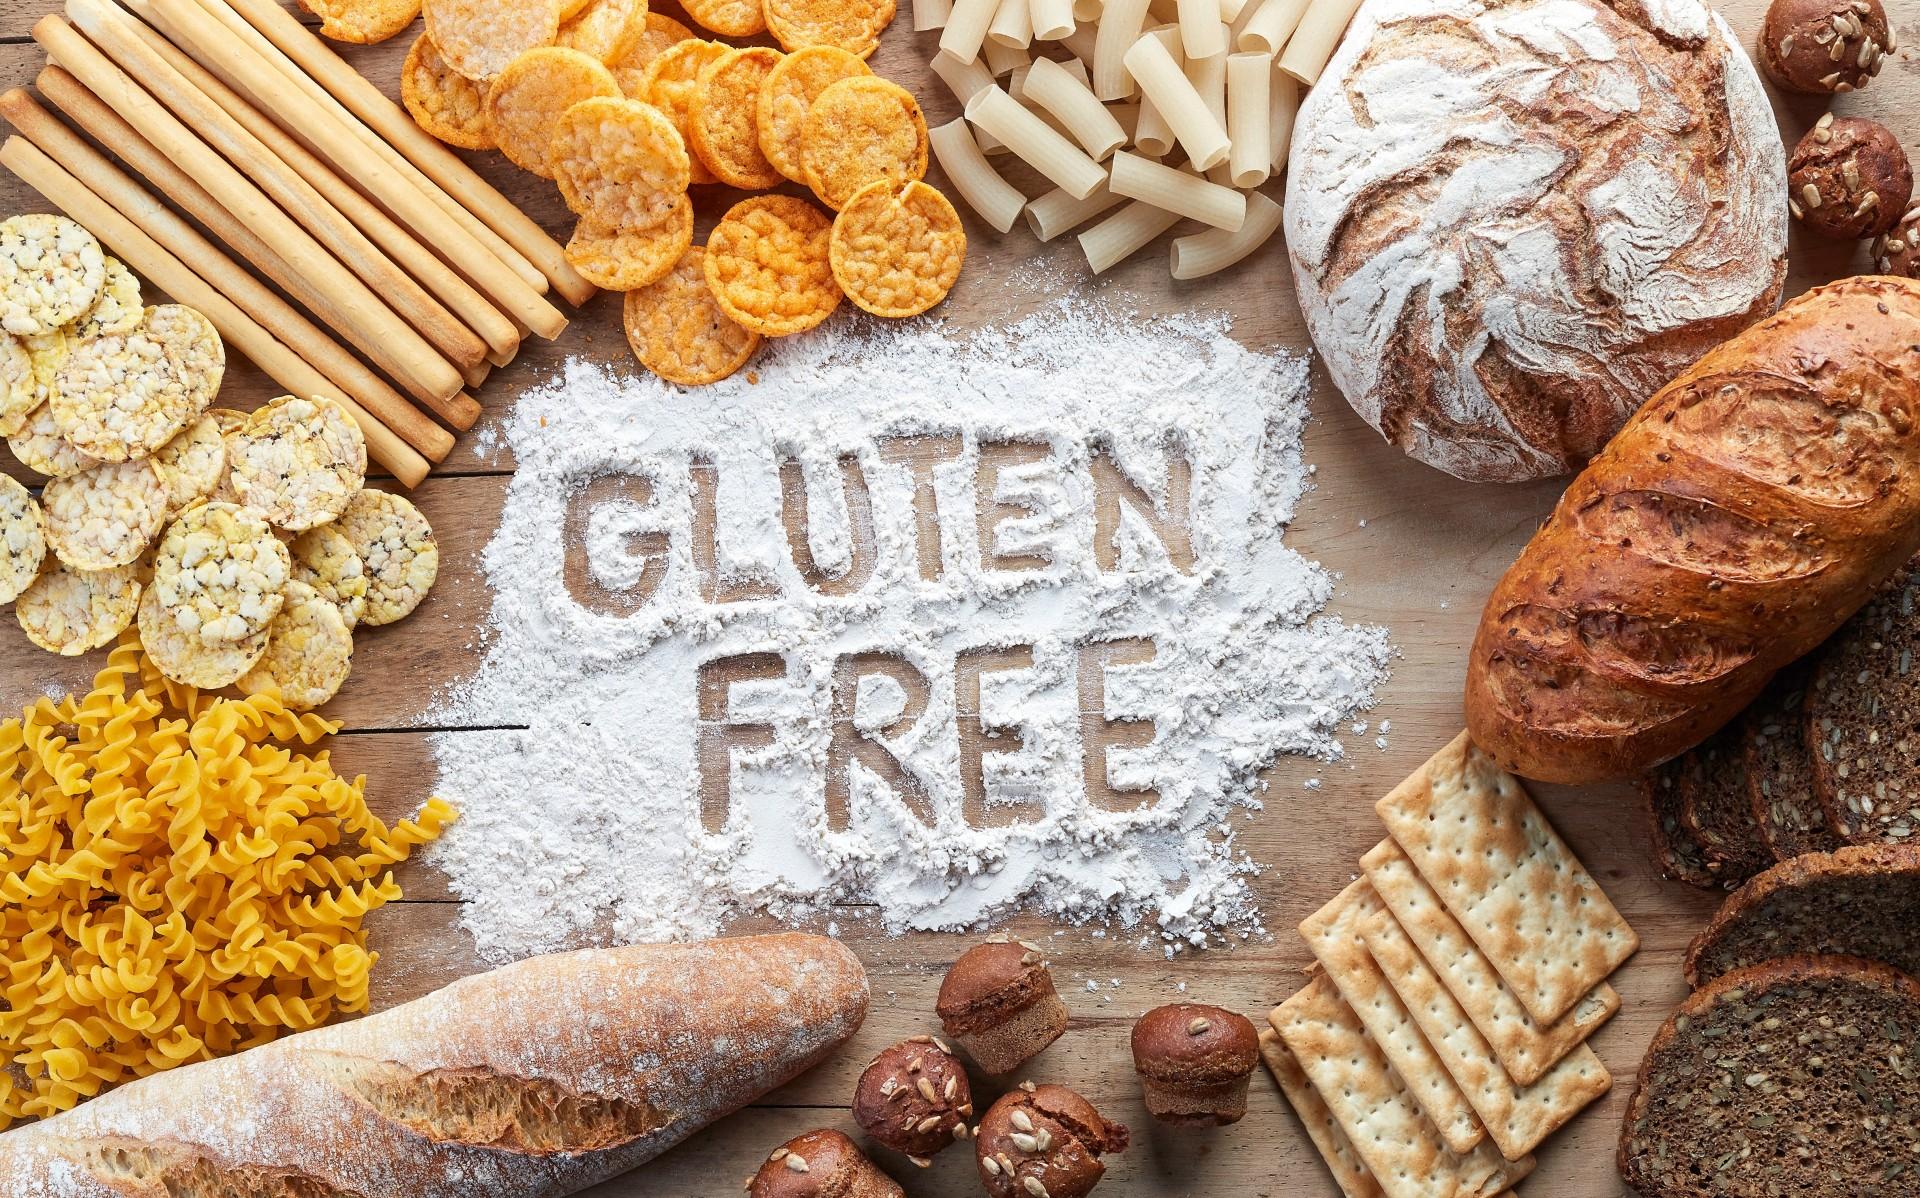 Celiac Disease and the Gluten-Free Diet